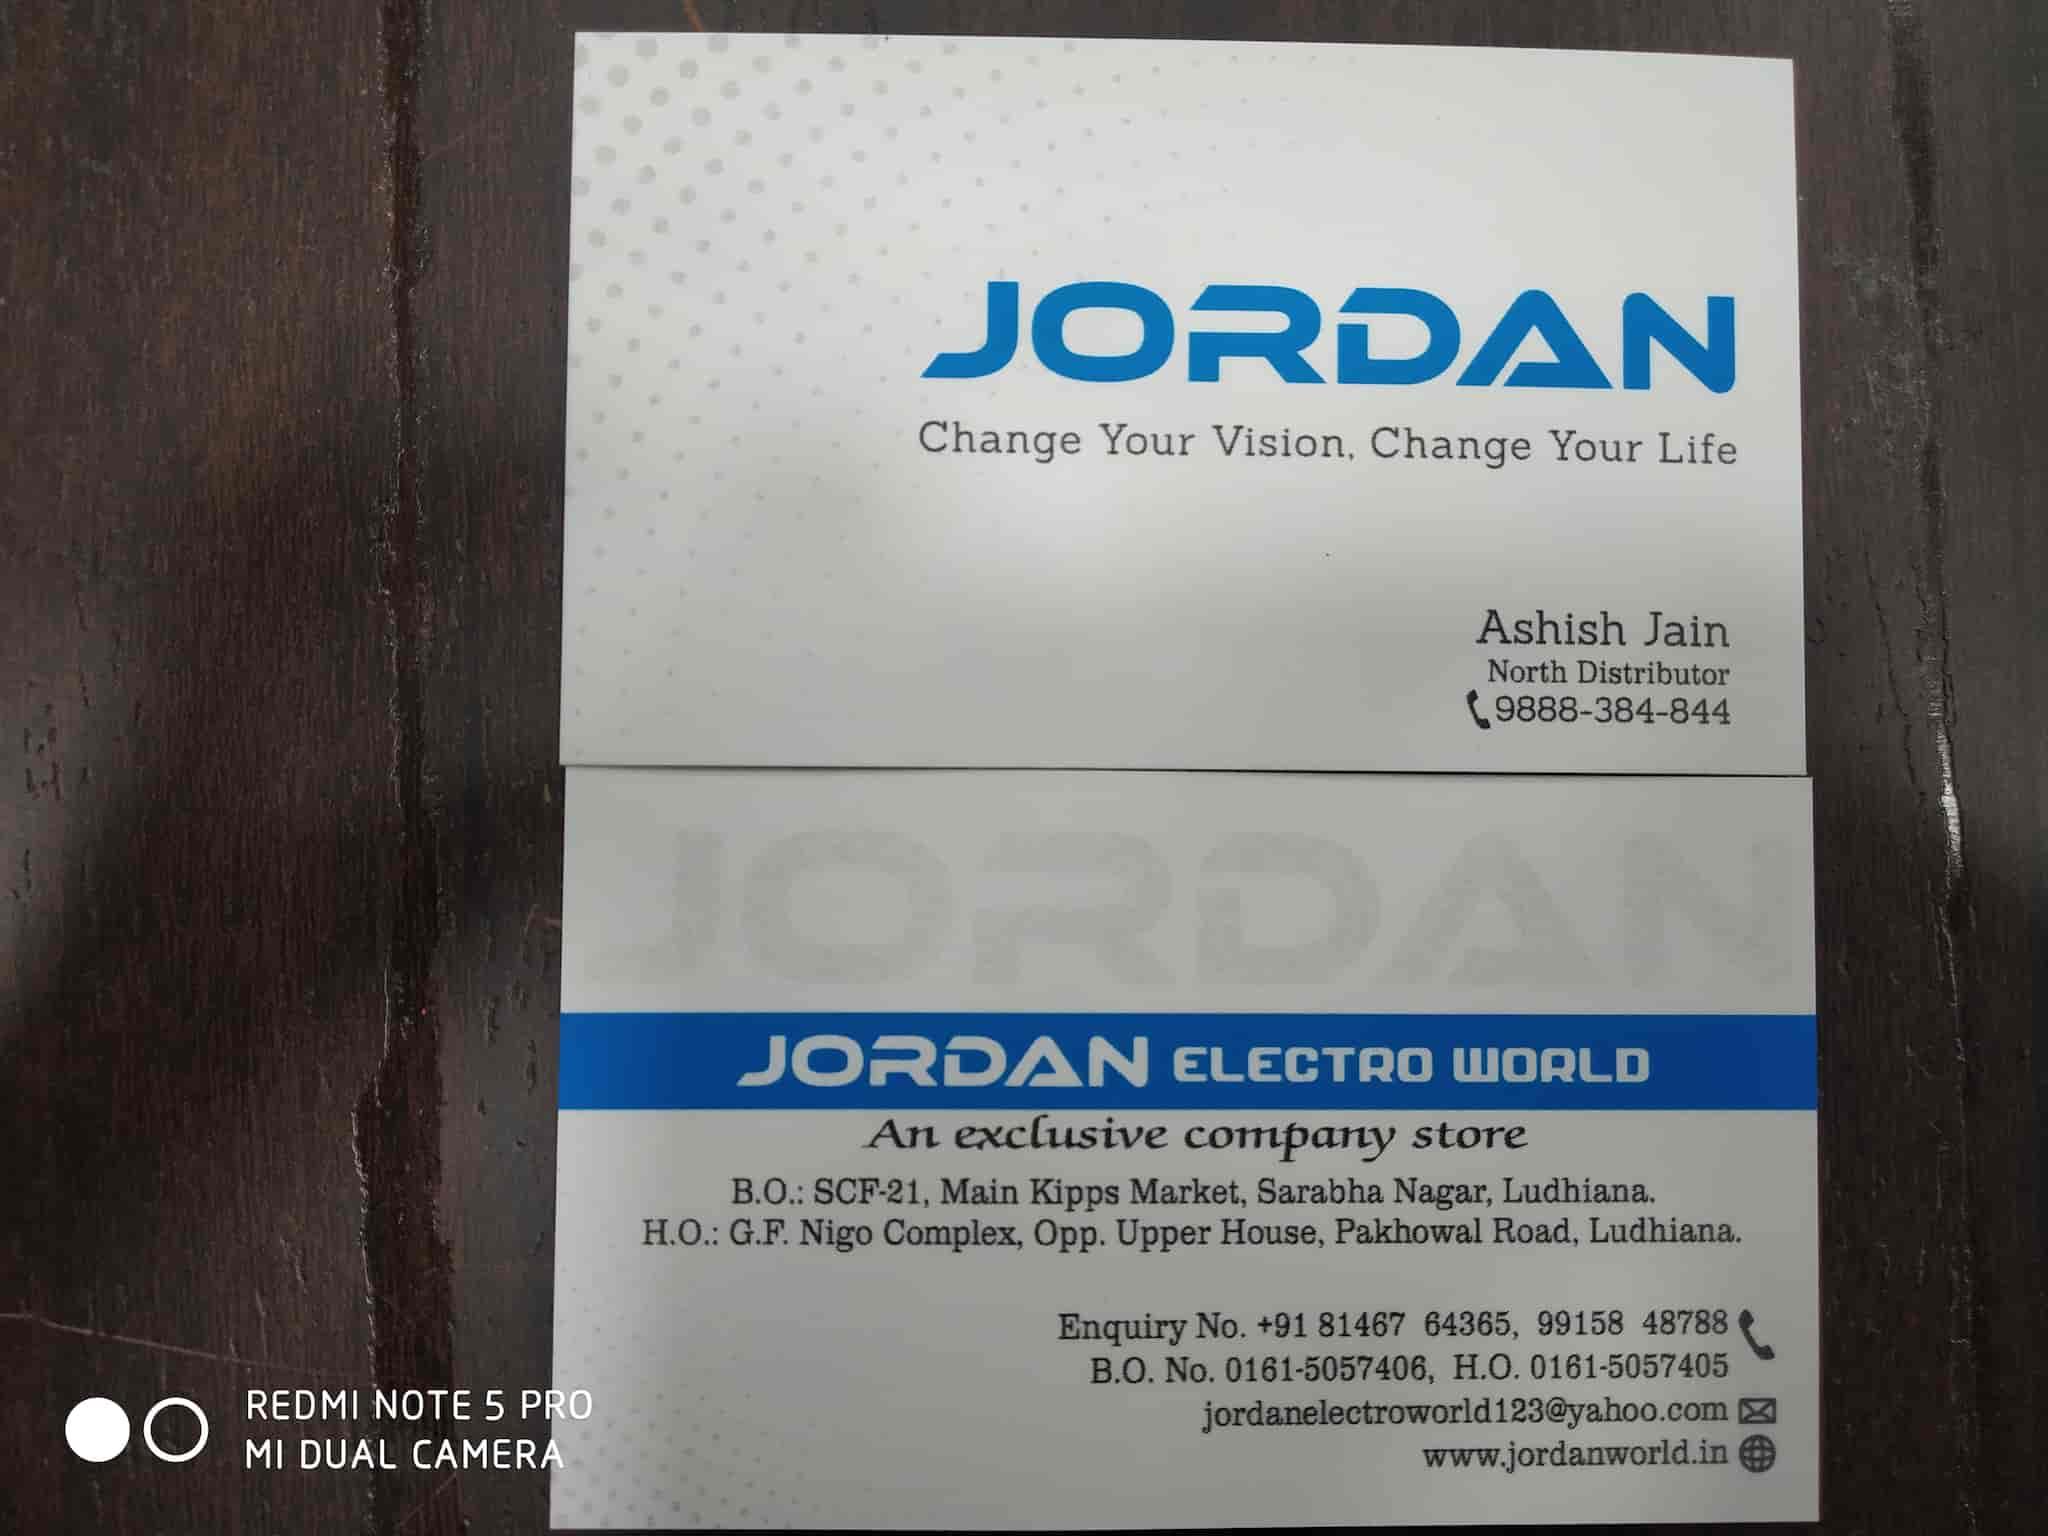 Jordan Electro World, Sarabha Nagar - CCTV Dealers in